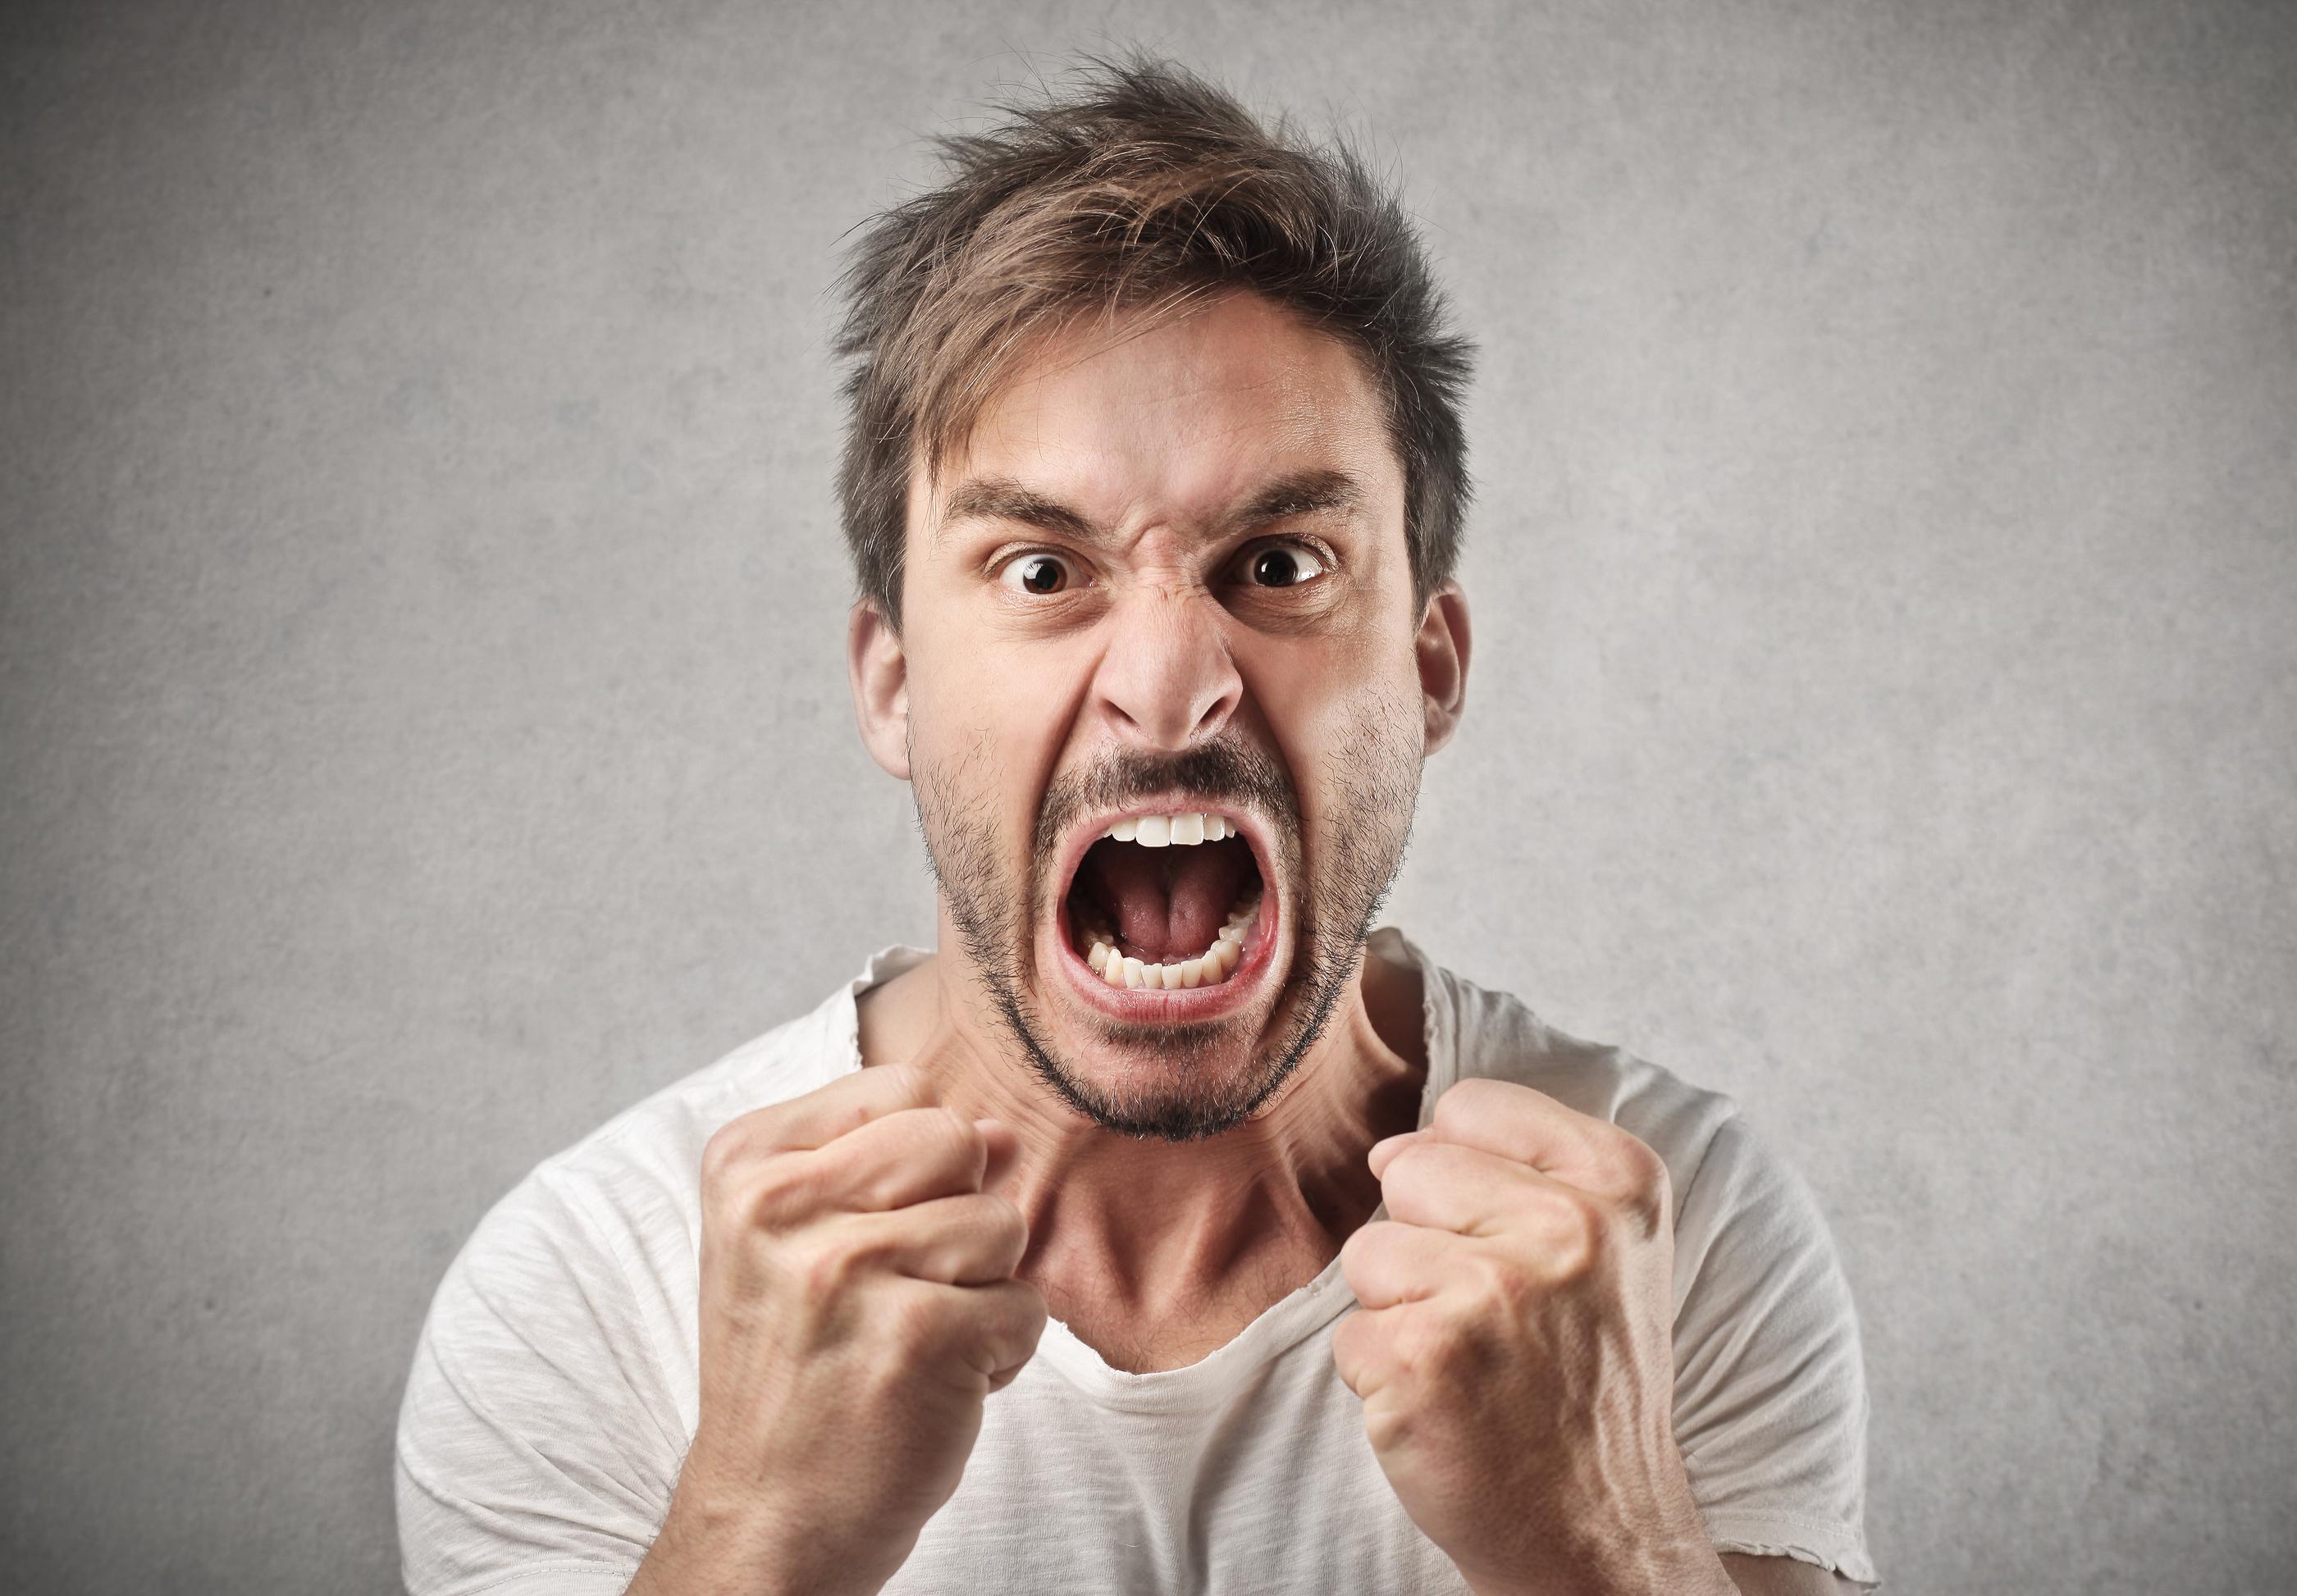 https://i2.wp.com/www.johnbarrettblog.com/wp-content/uploads/2013/11/bigstock-portrait-of-young-angry-man-52068682.jpg